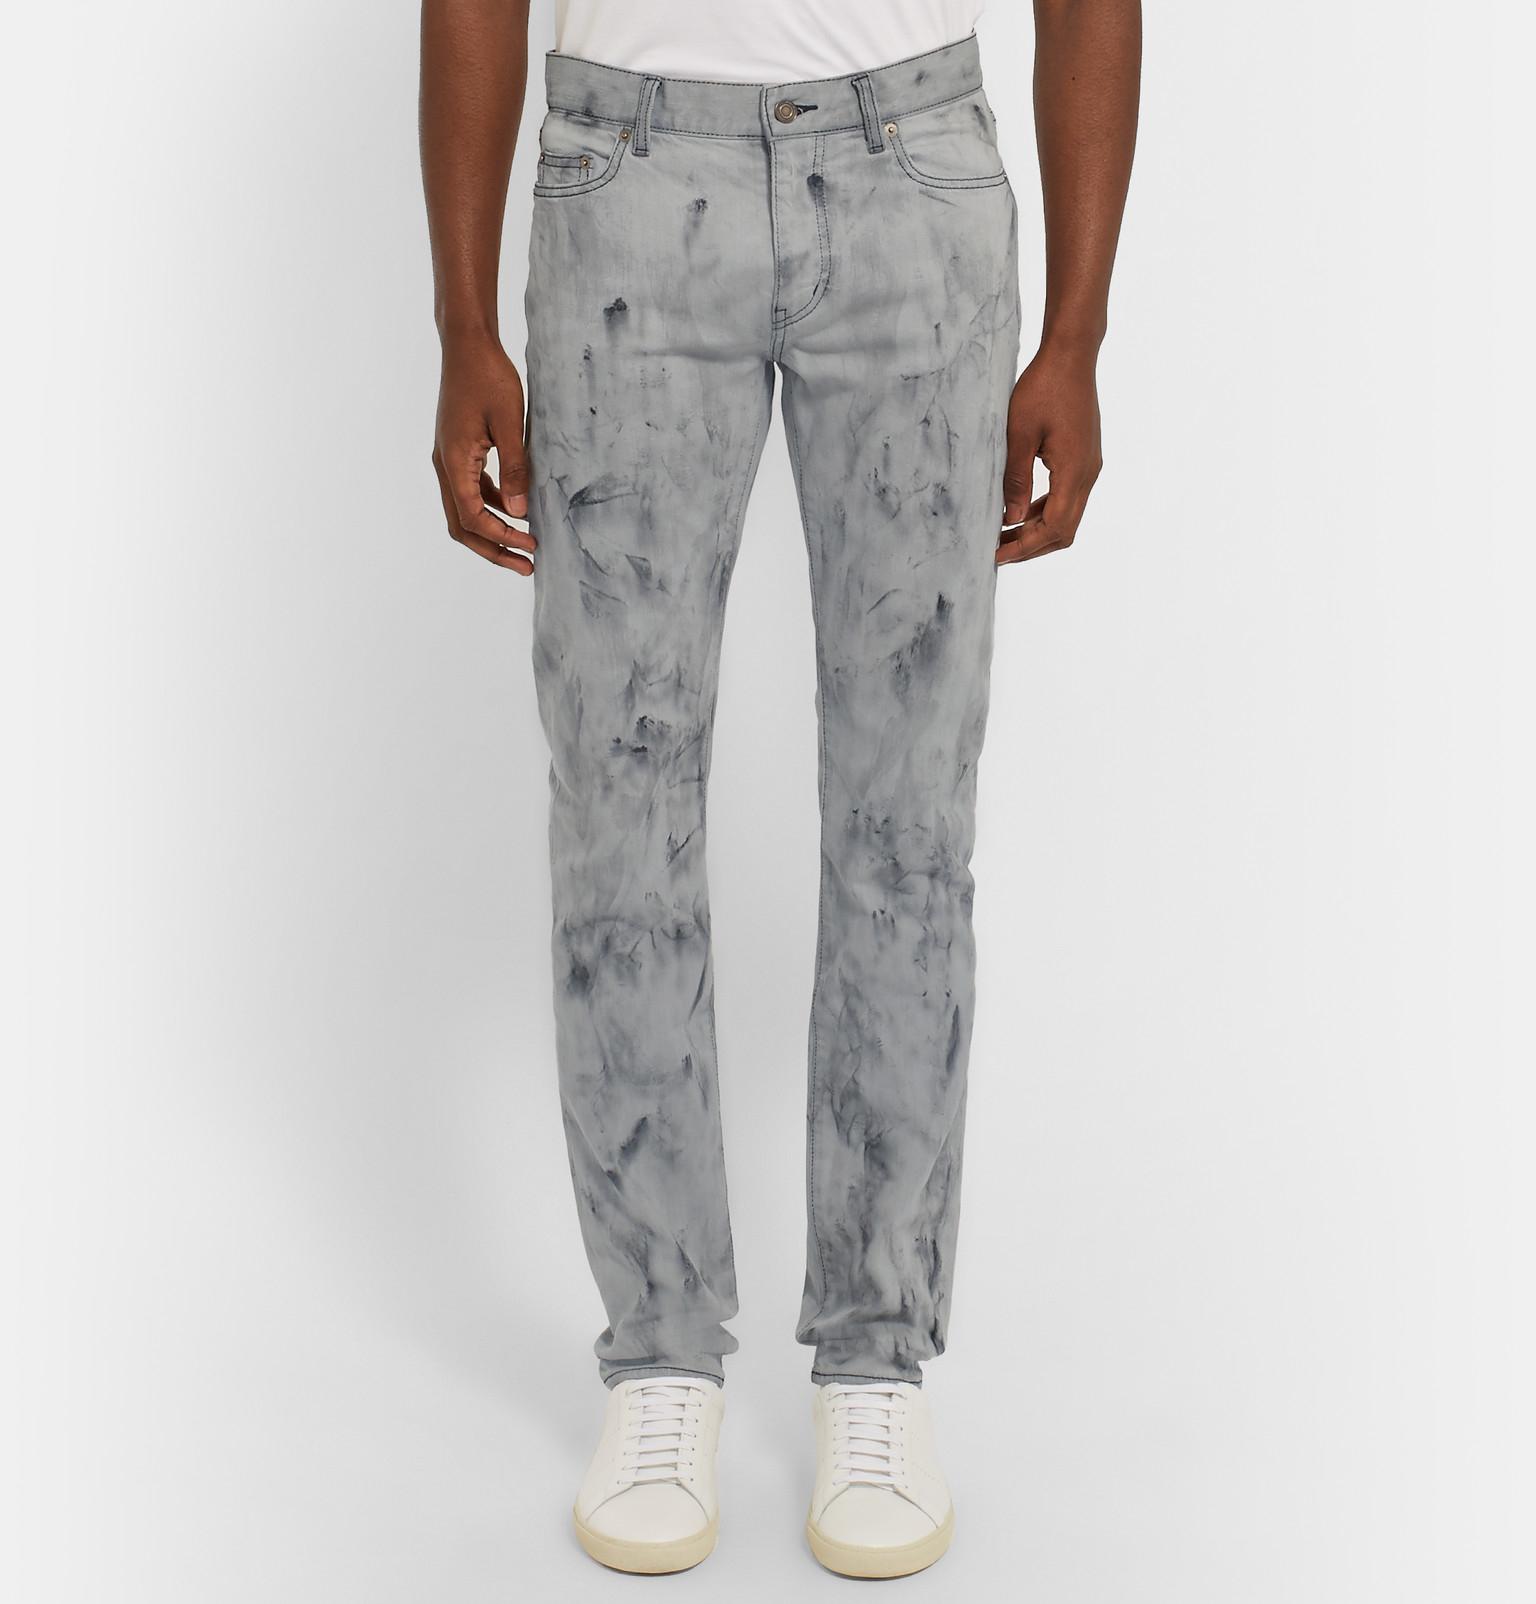 Saint Laurent Skinny Fit Marble Print Stretch Denim Jeans